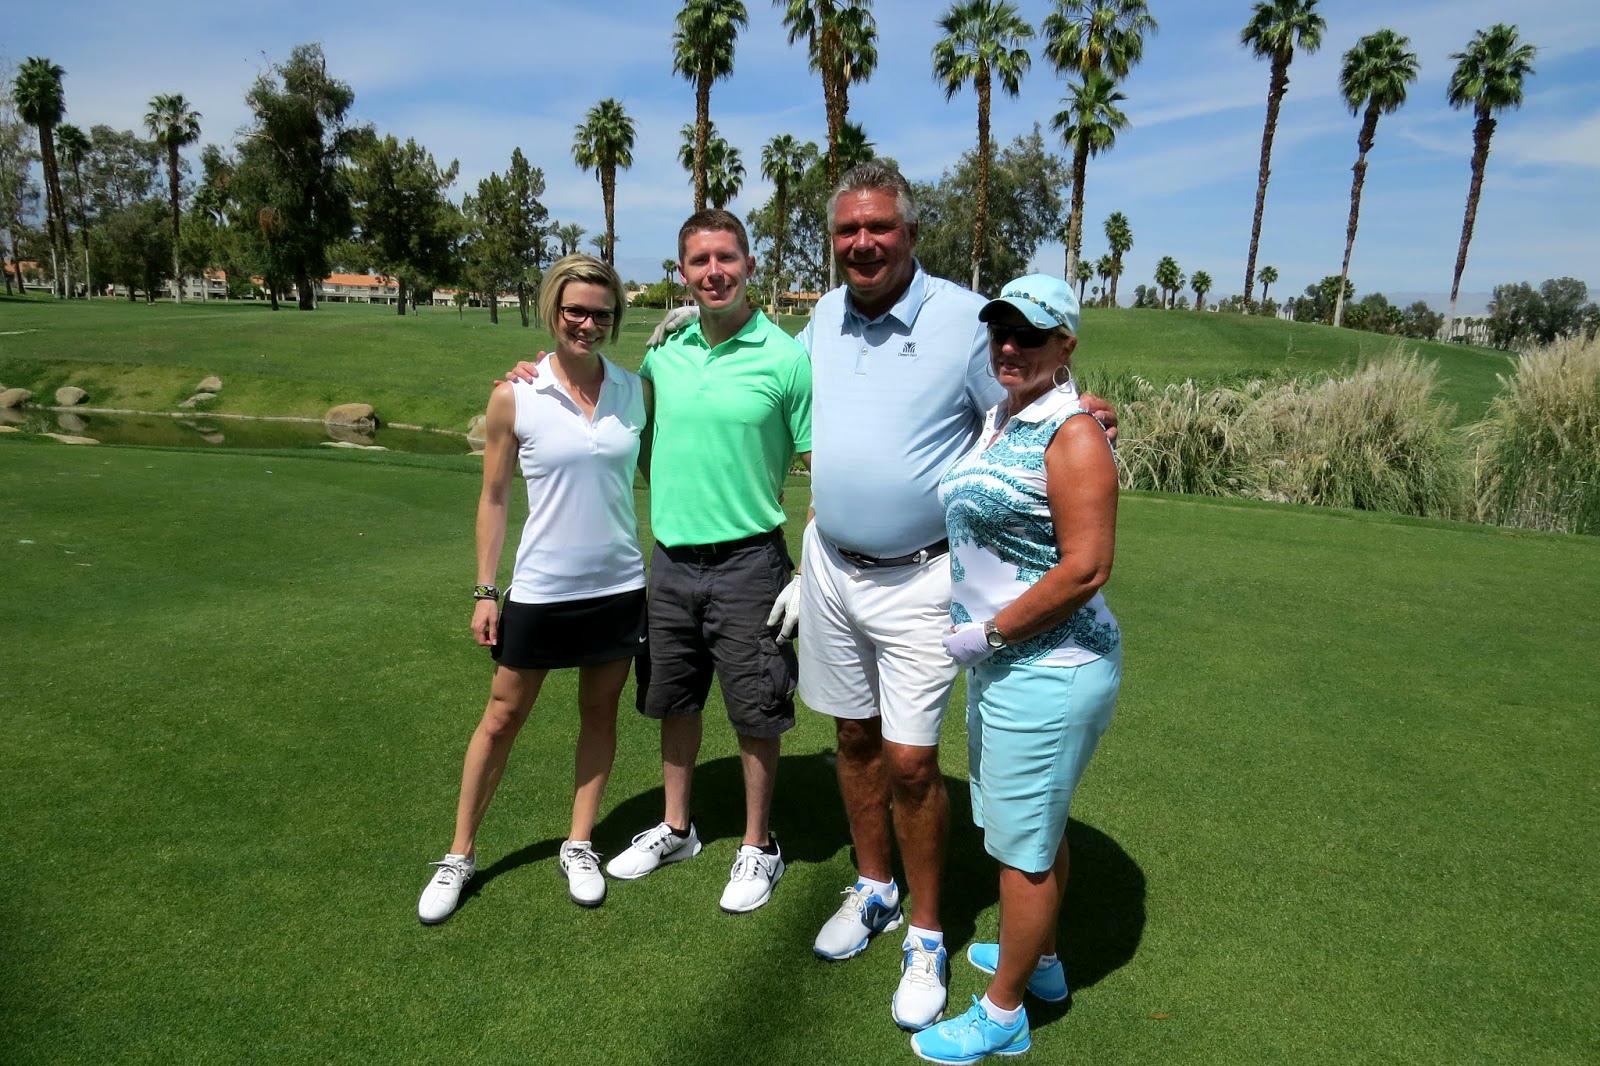 Palm Desert California, Desert Falls Country Club, Aunie Sauce Travels